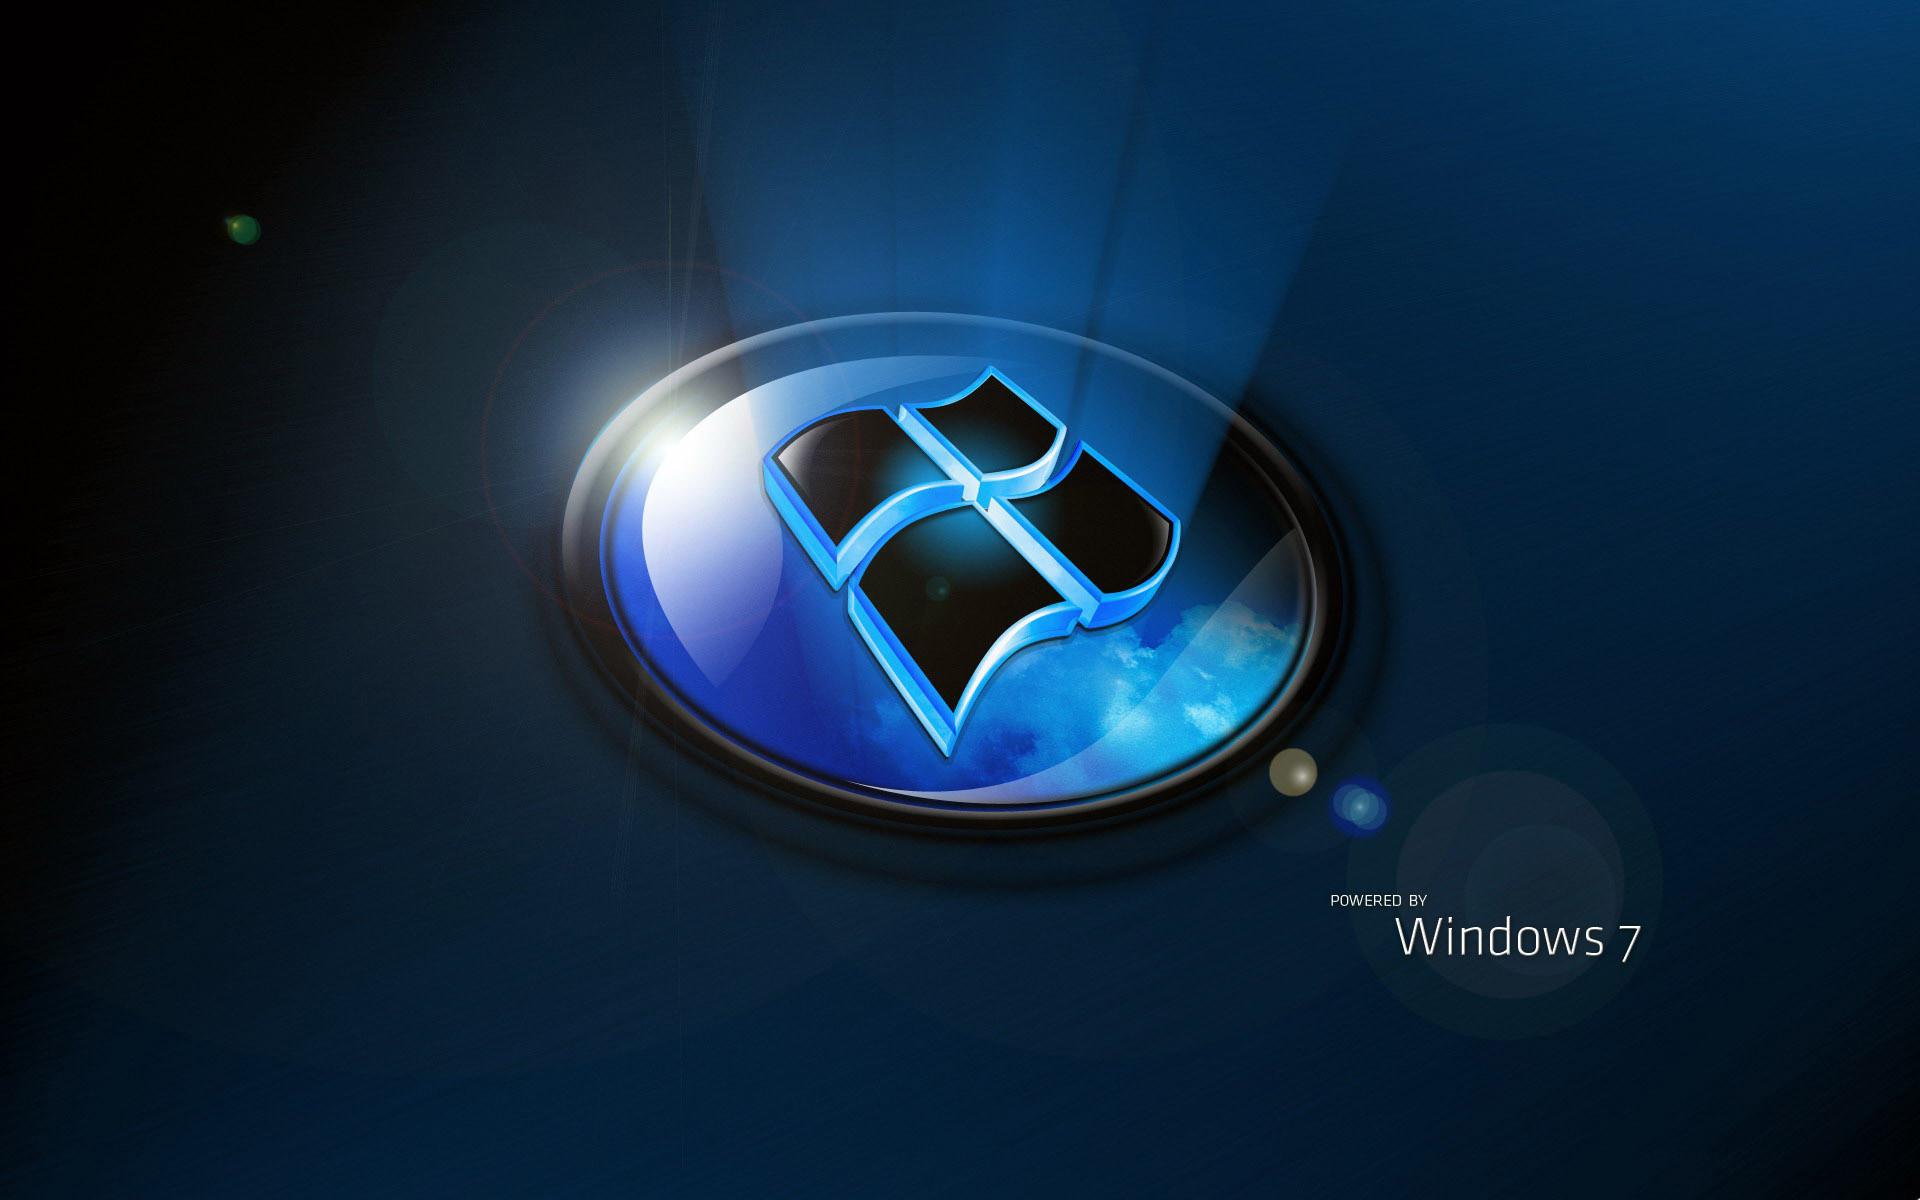 Desktop Wallpapers For Windows 7 Wallpapers) – Adorable Wallpapers